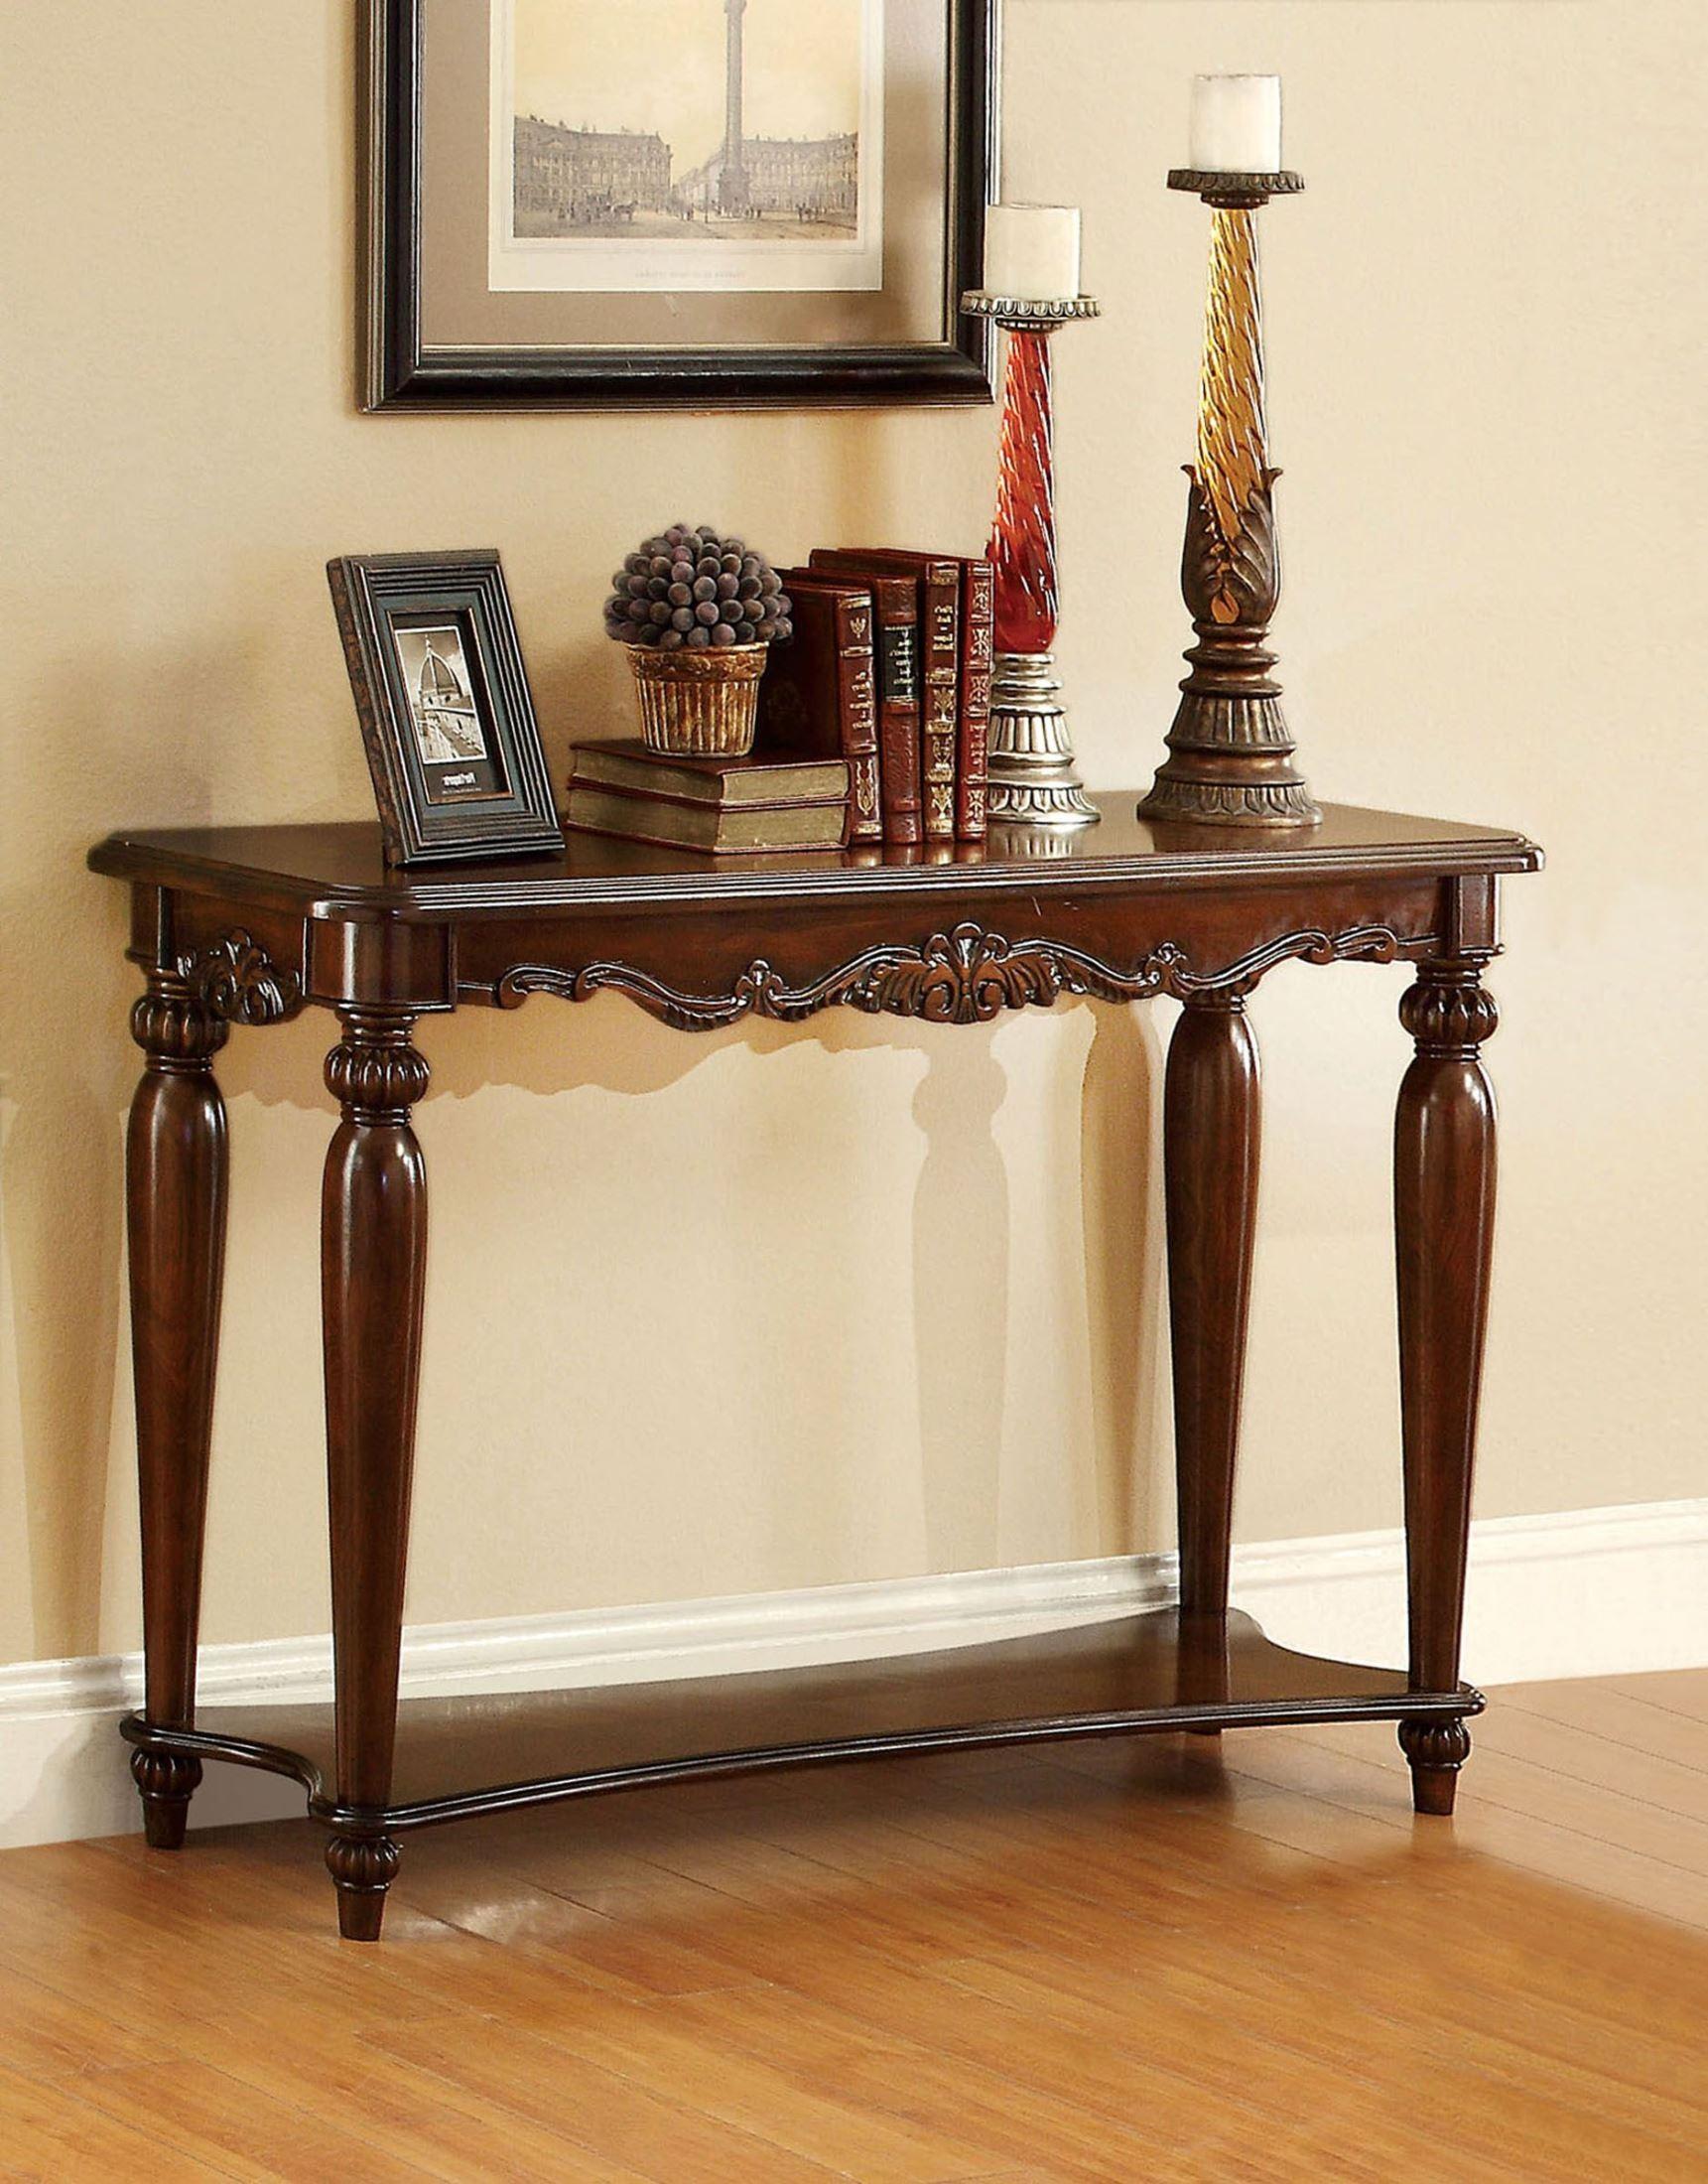 Bunbury Cherry Sofa Table from Furniture of America ...